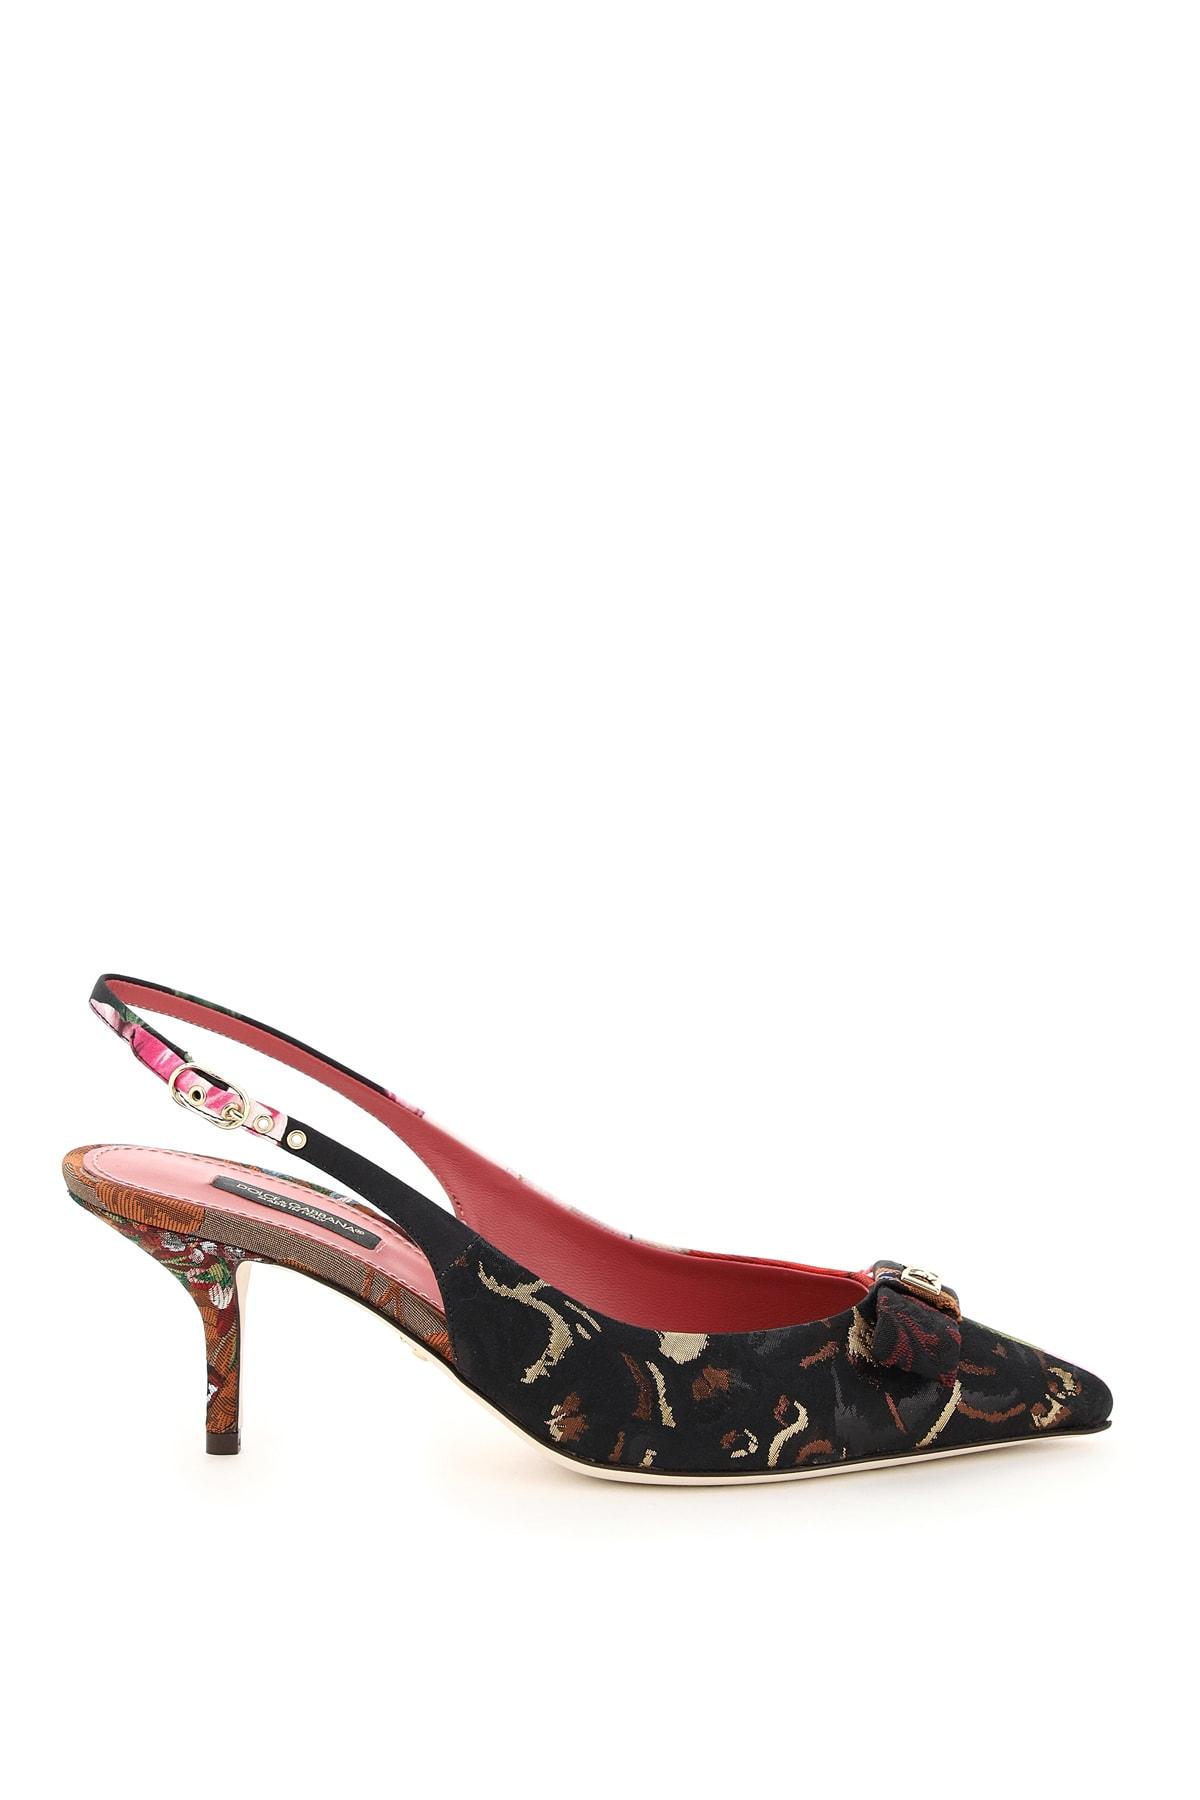 Dolce & Gabbana Leathers CARDINALE SLINGBACK PUMPS 16 PATCH